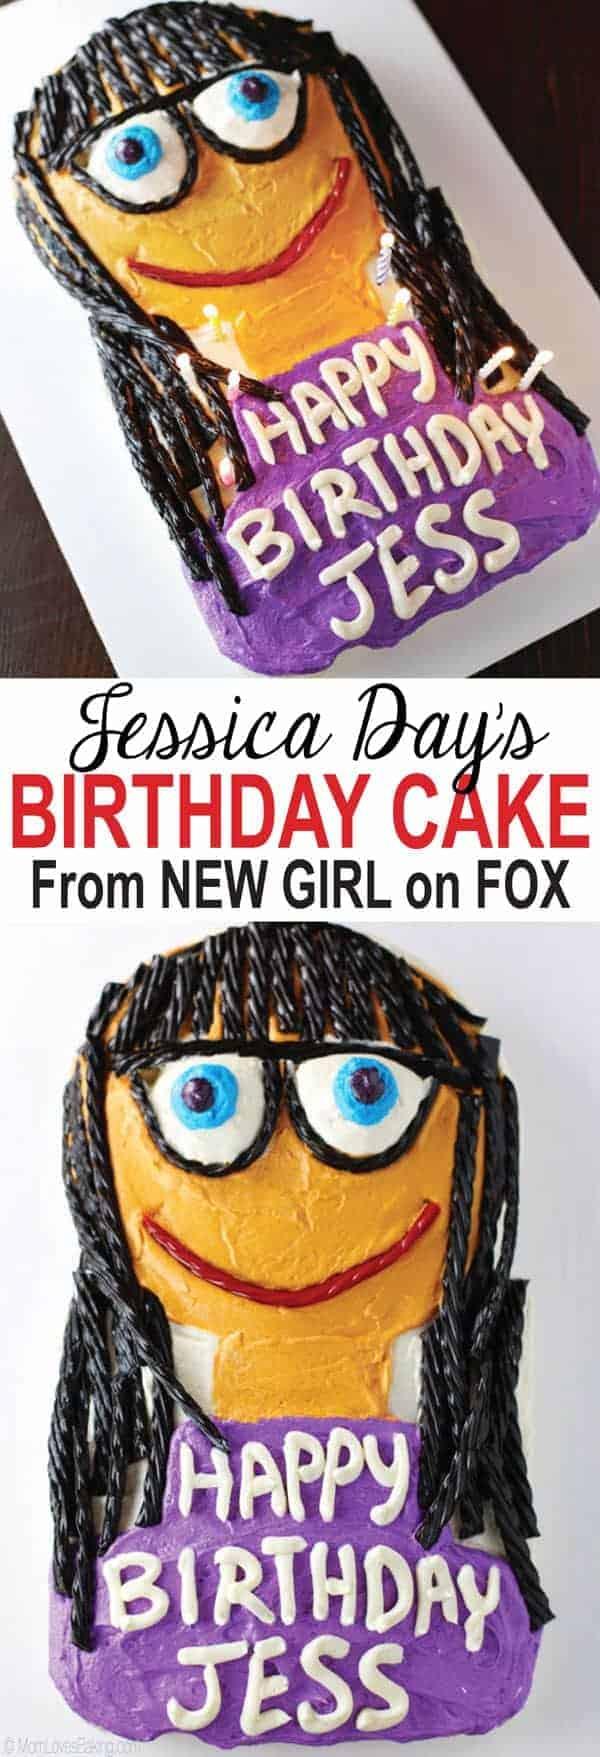 New Girl Birthday Cake